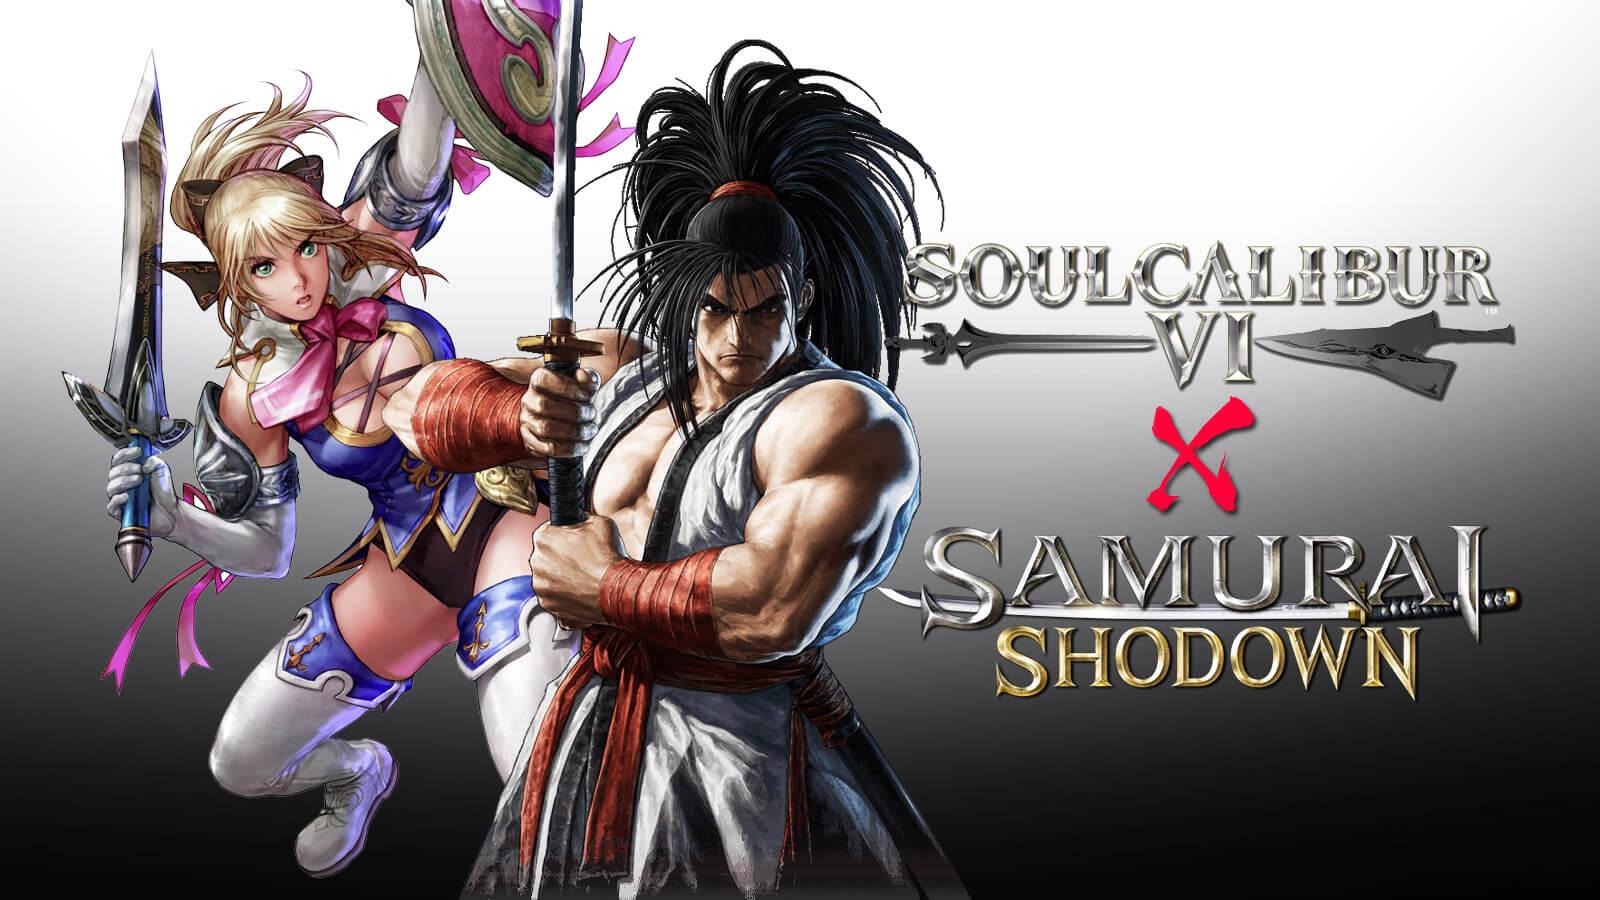 Soulcalibur 6 Adds Cassandra and Haohmaru - Gameslaught